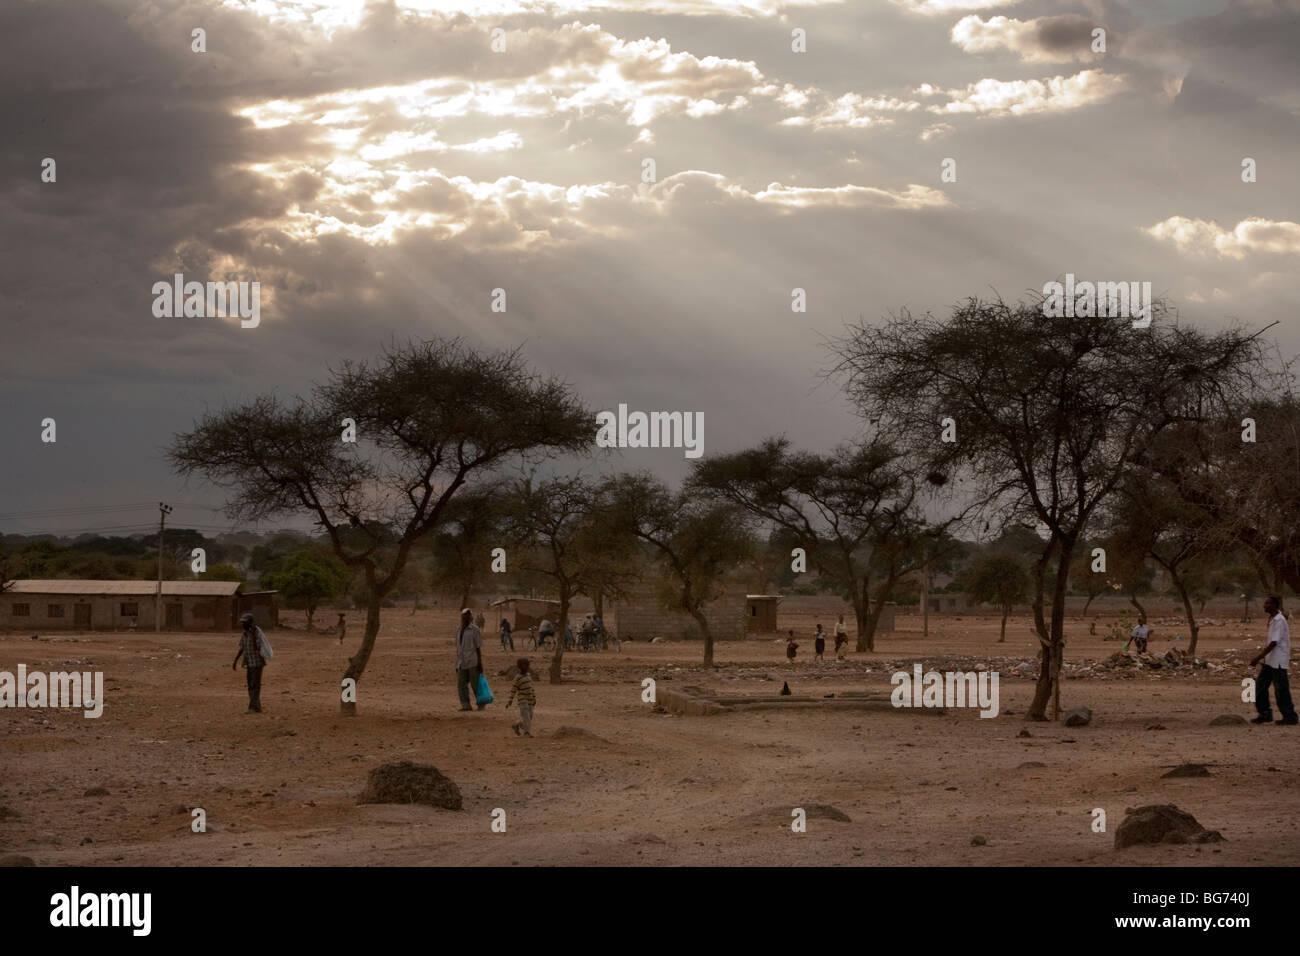 The sun shines through the clouds in the Tanzanite mining town of Mererani, Tanzania. - Stock Image